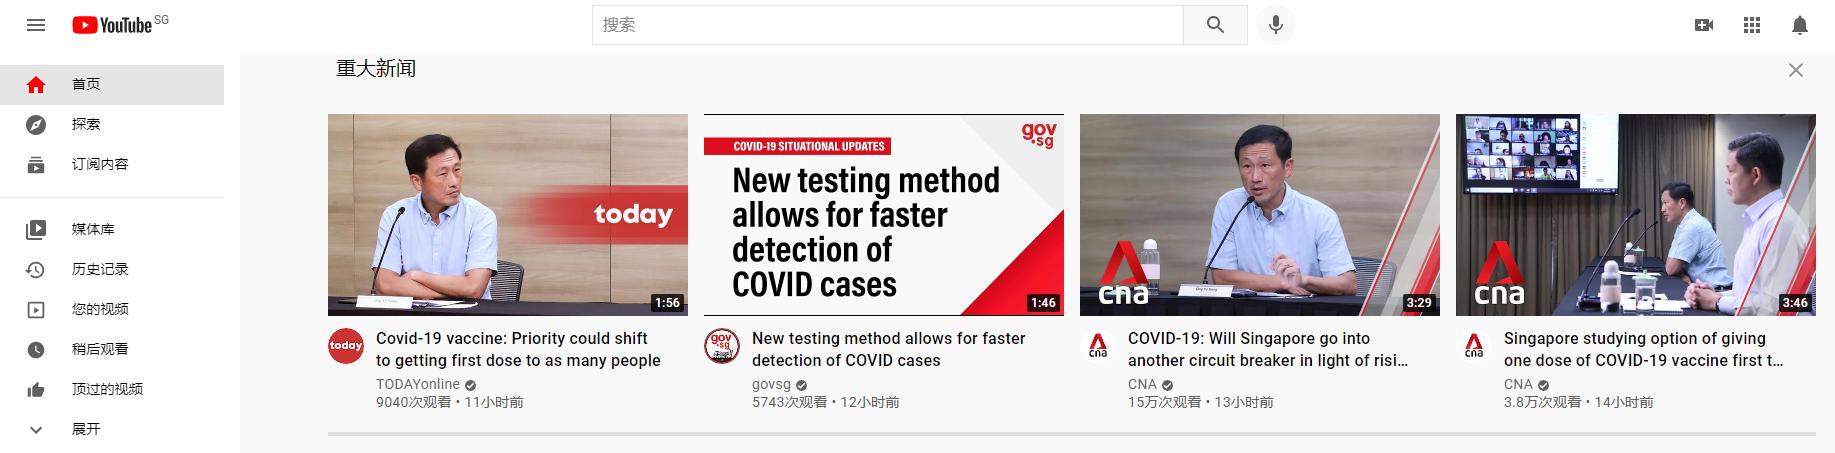 YouTube推出短视频功能:应对来自TikTok的焦虑